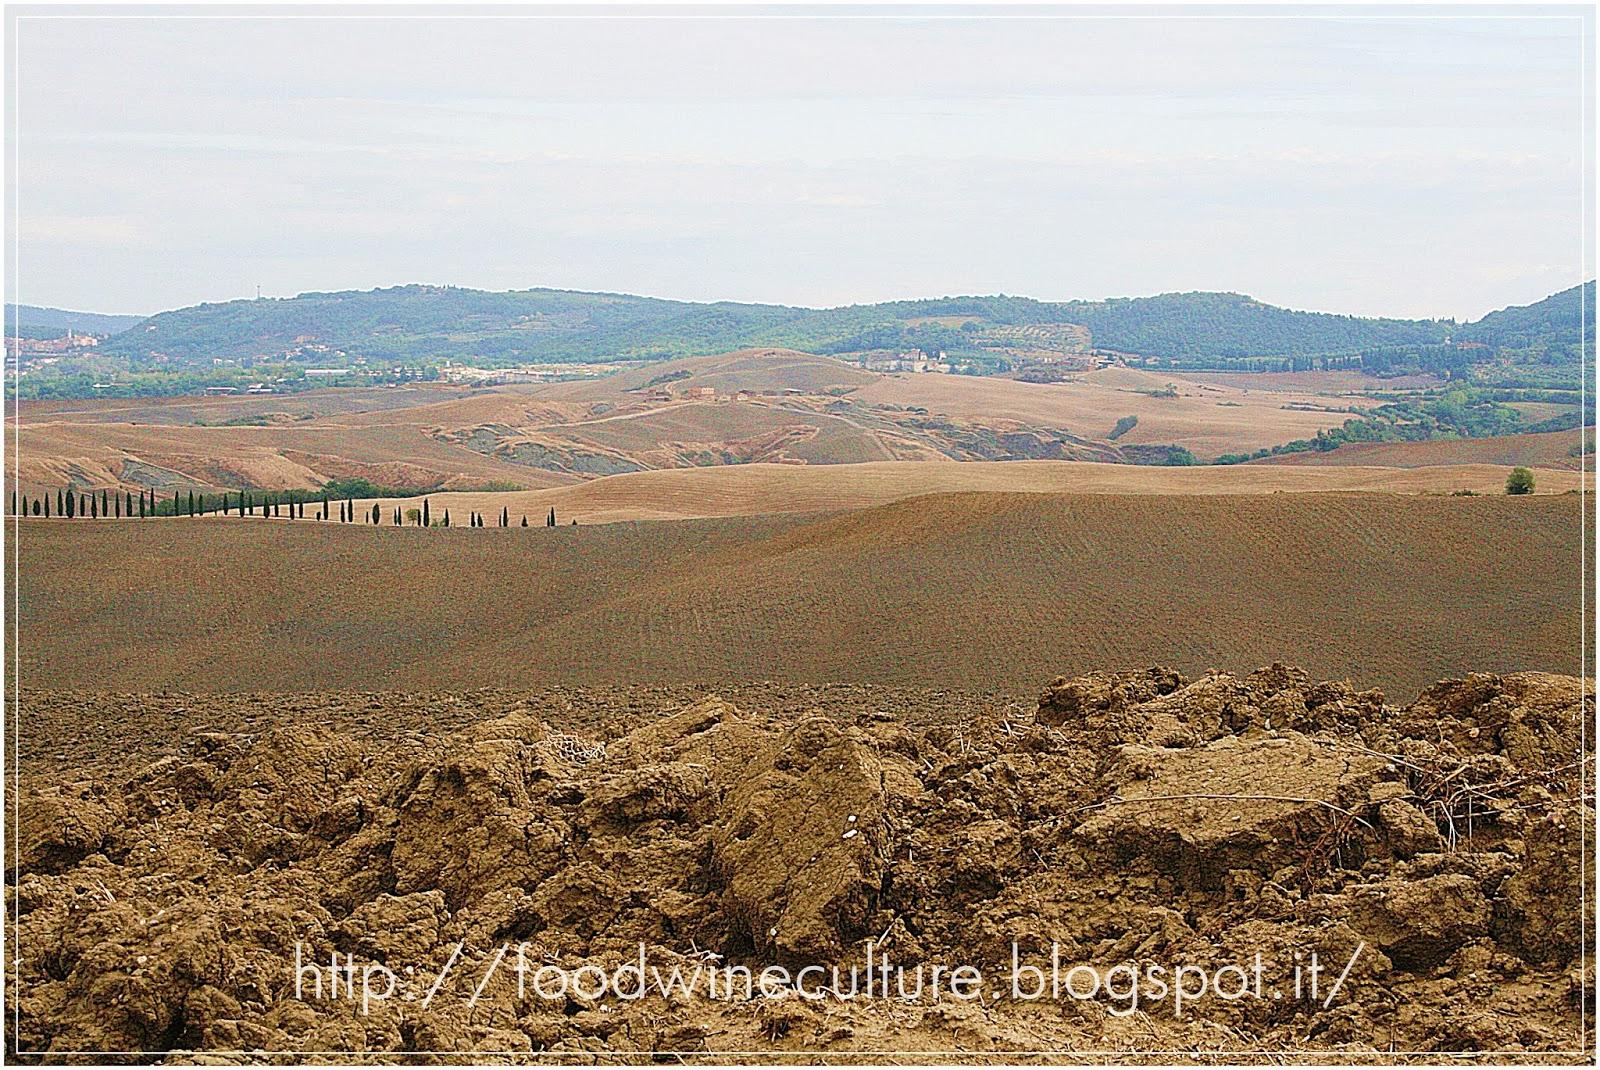 Terra Toscana